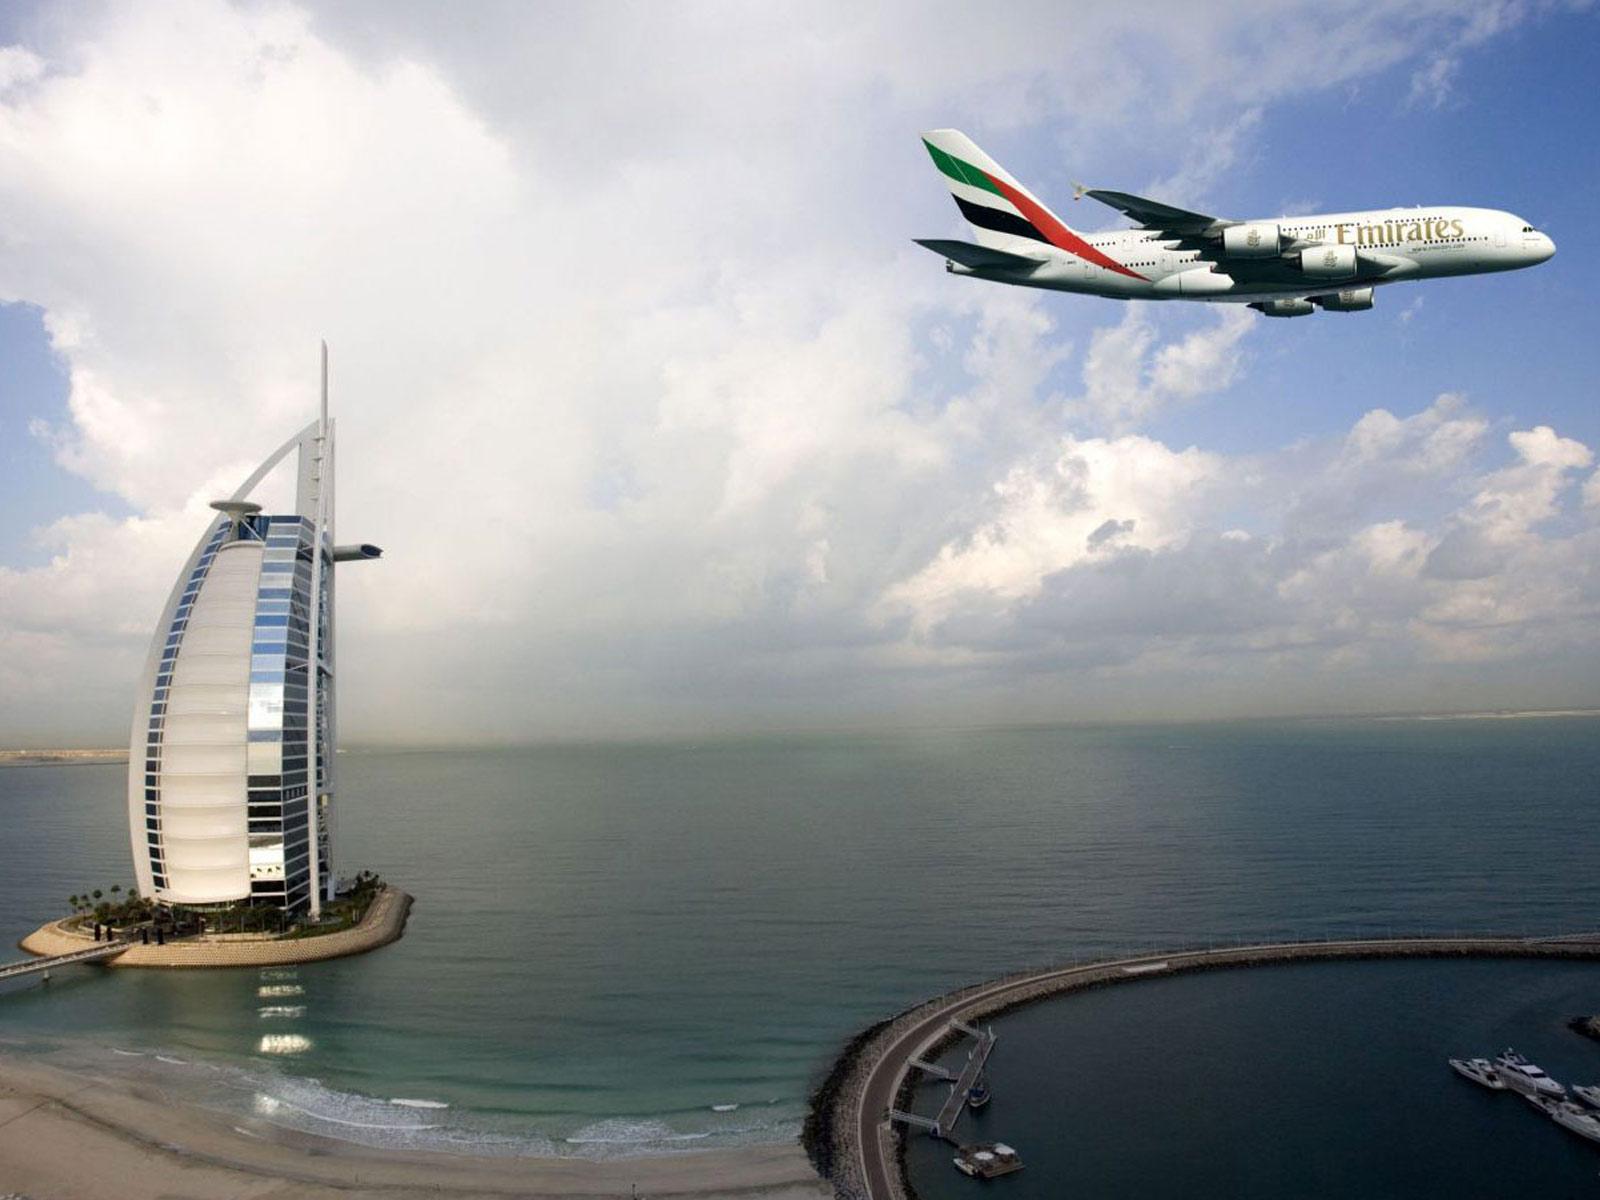 Emirates Dubai Burj Al Arab Wallpapers HD Wallpapers 1600x1200